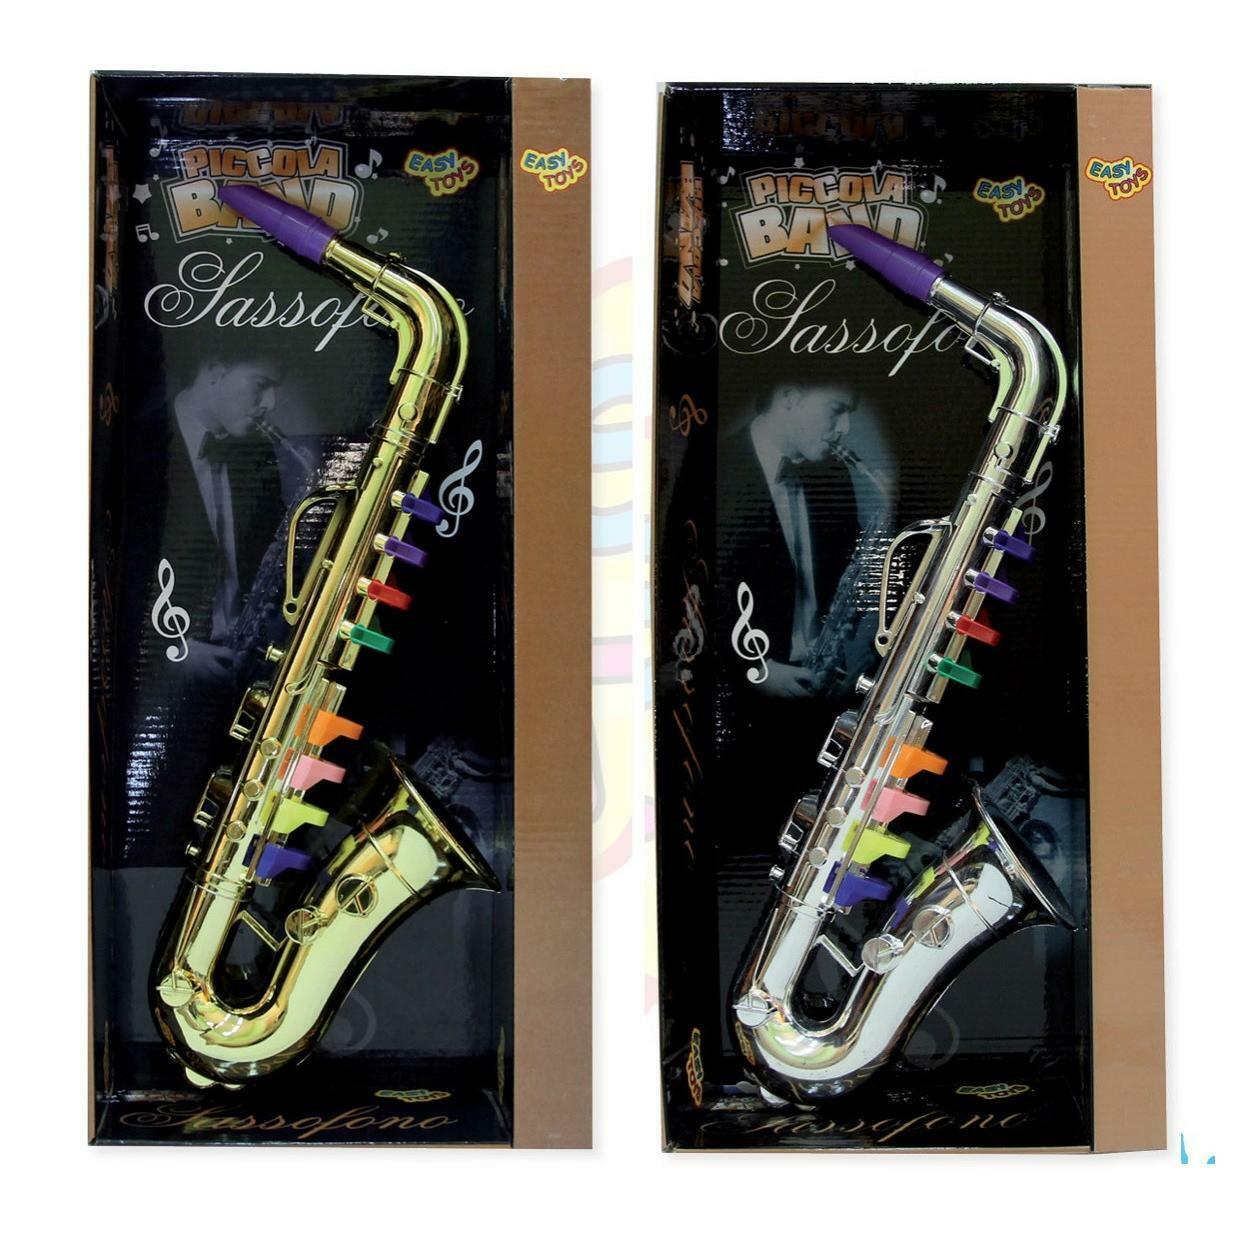 giocattoli sassofono cromato 40 cm